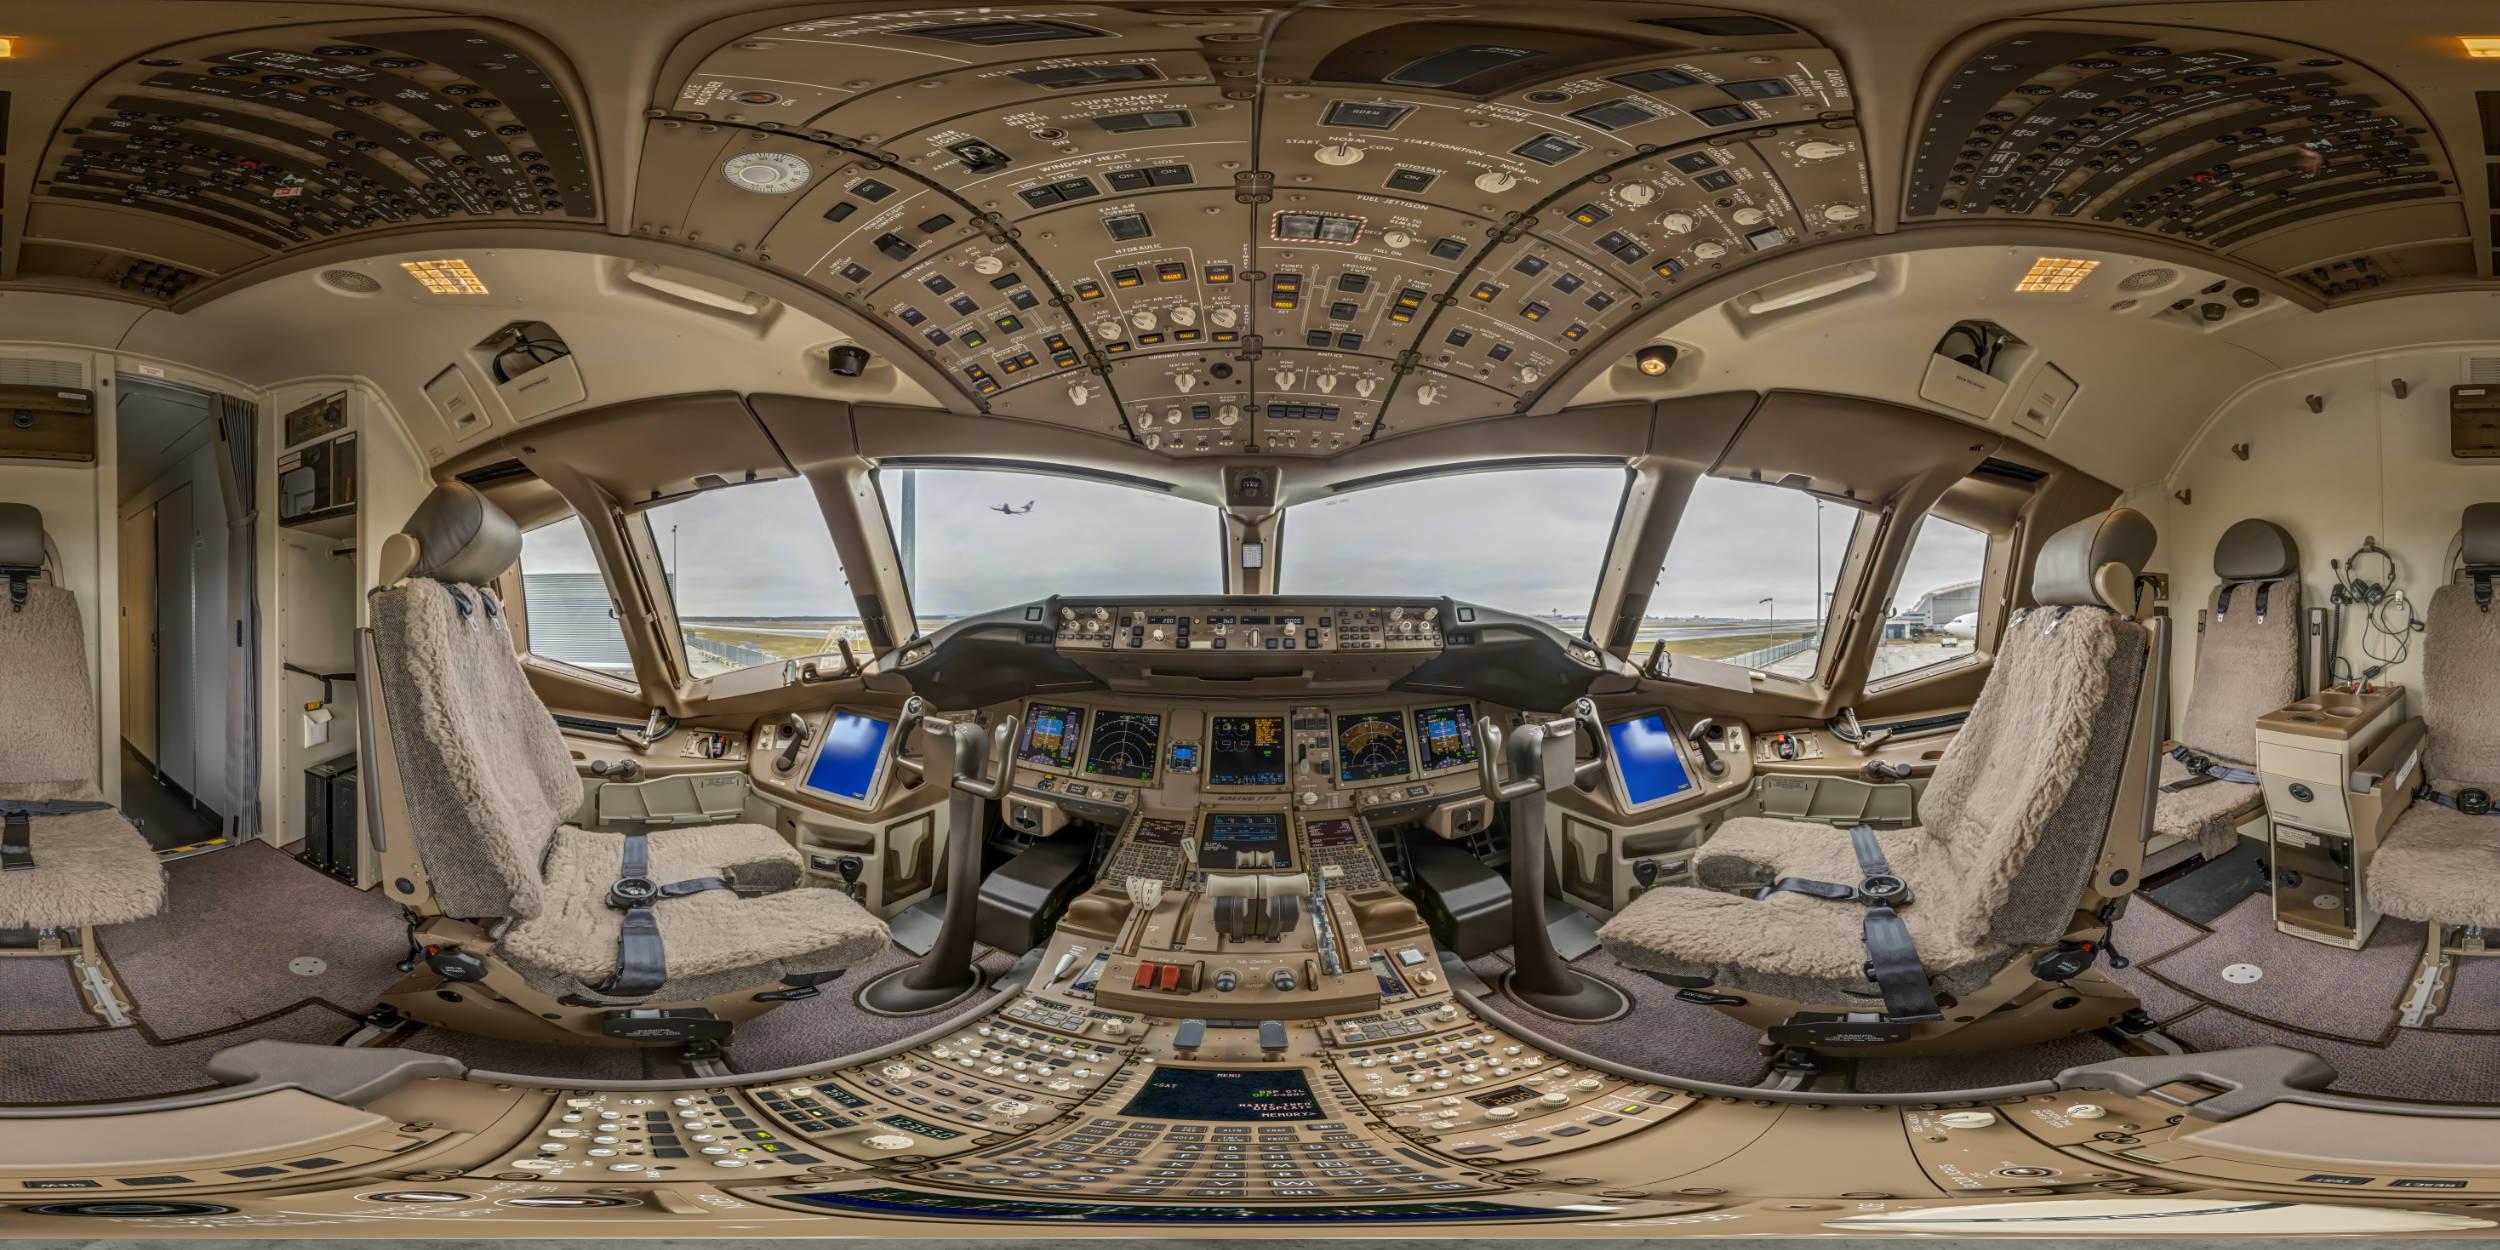 Panoramafotografie Virtuelle Touren 360Grad Fotografie Stuttgart und Umgebung Panorama 360°x180° Sphäre Flughafen Frankfurt Lufthansa Technik Boing 777 Cockpit